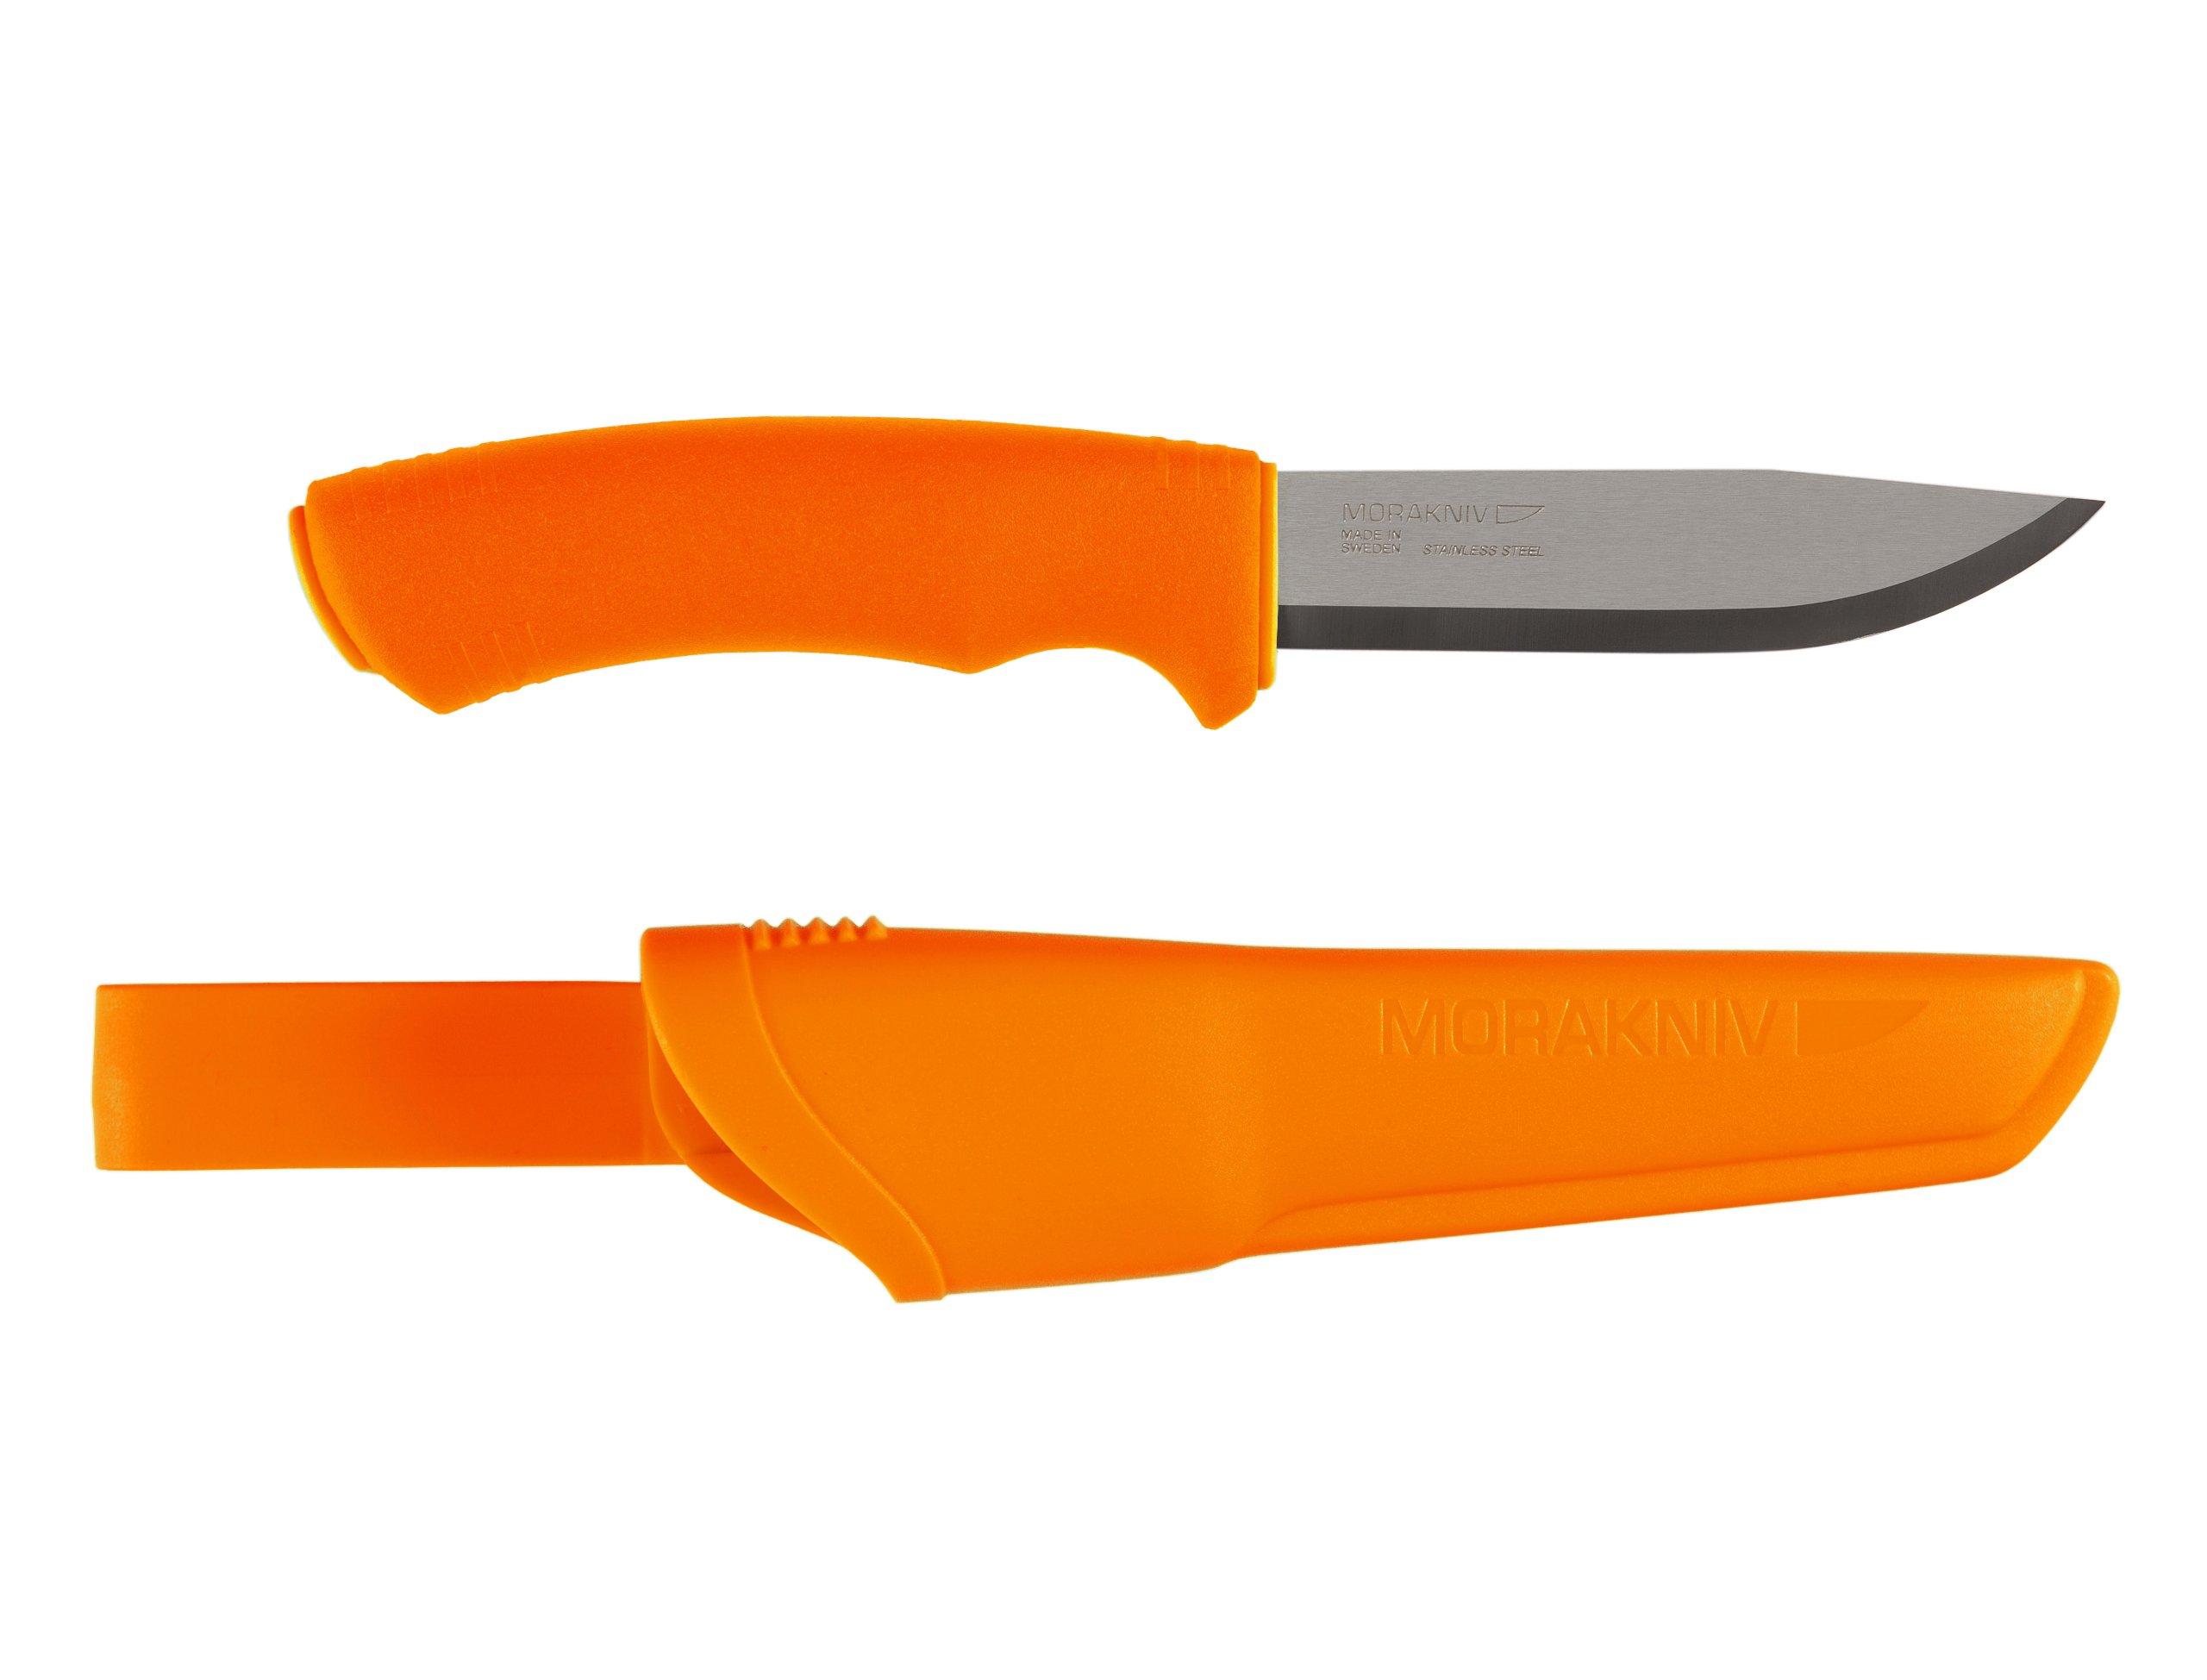 Morakniv Bushcraft Fixed Blade Knife with Sandvik Stainless Steel Blade, Orange, 0.125/4.3-Inch